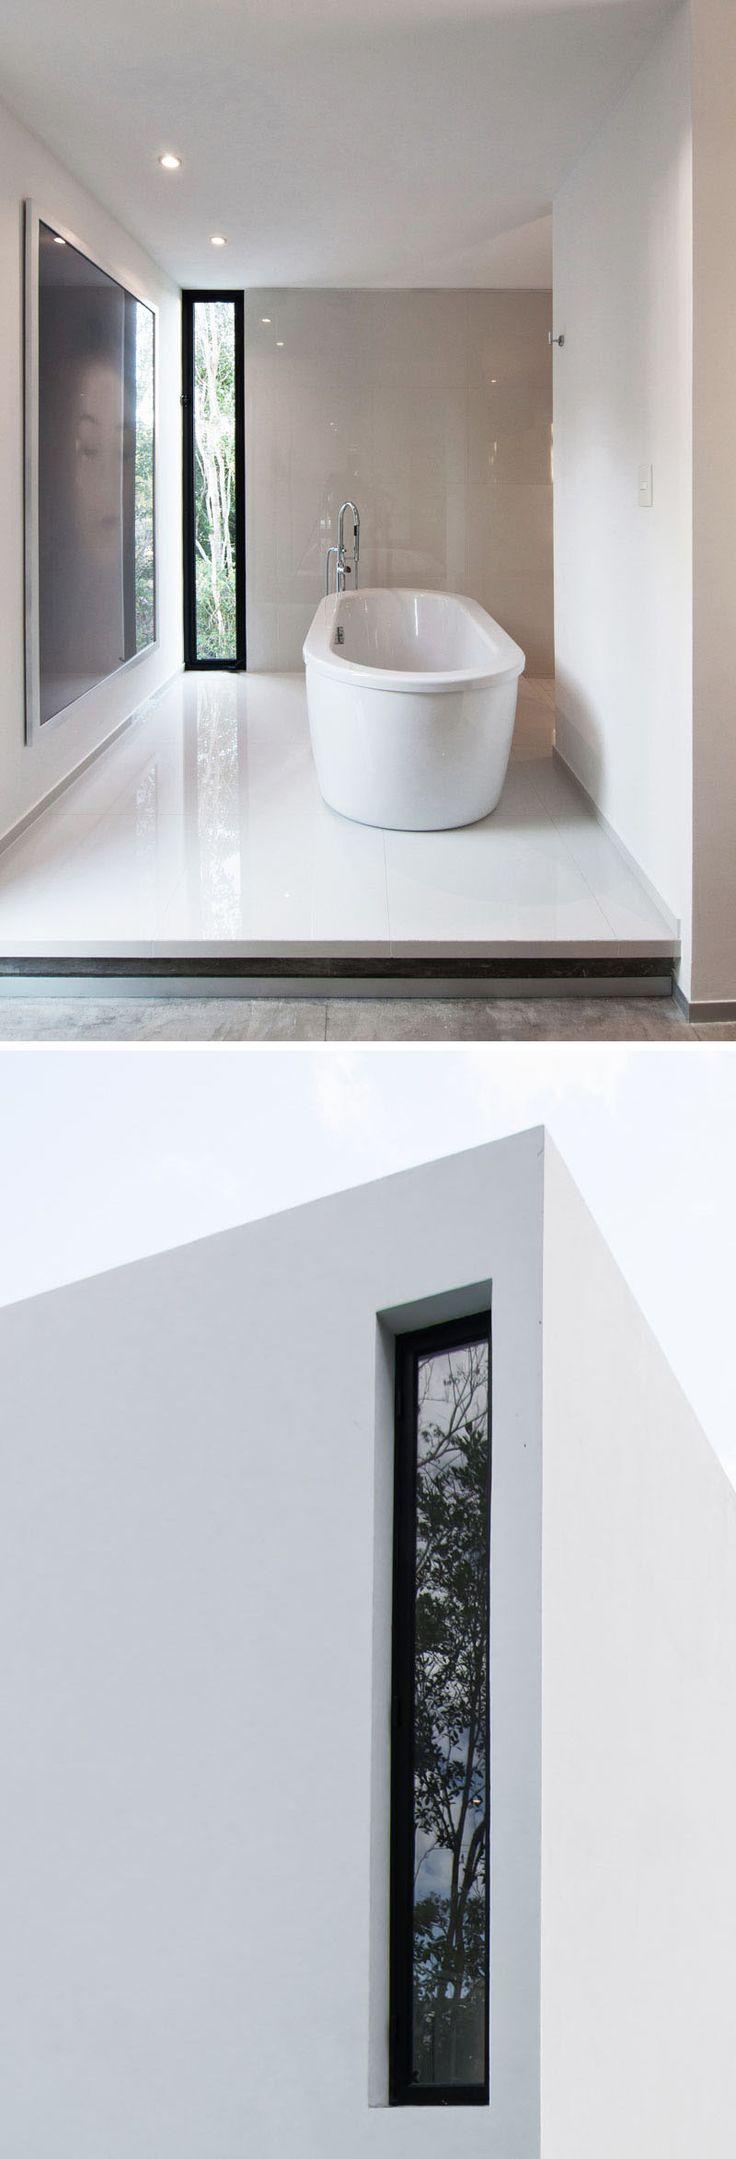 1000 ideas about shower window on pinterest glass block for Narrow window